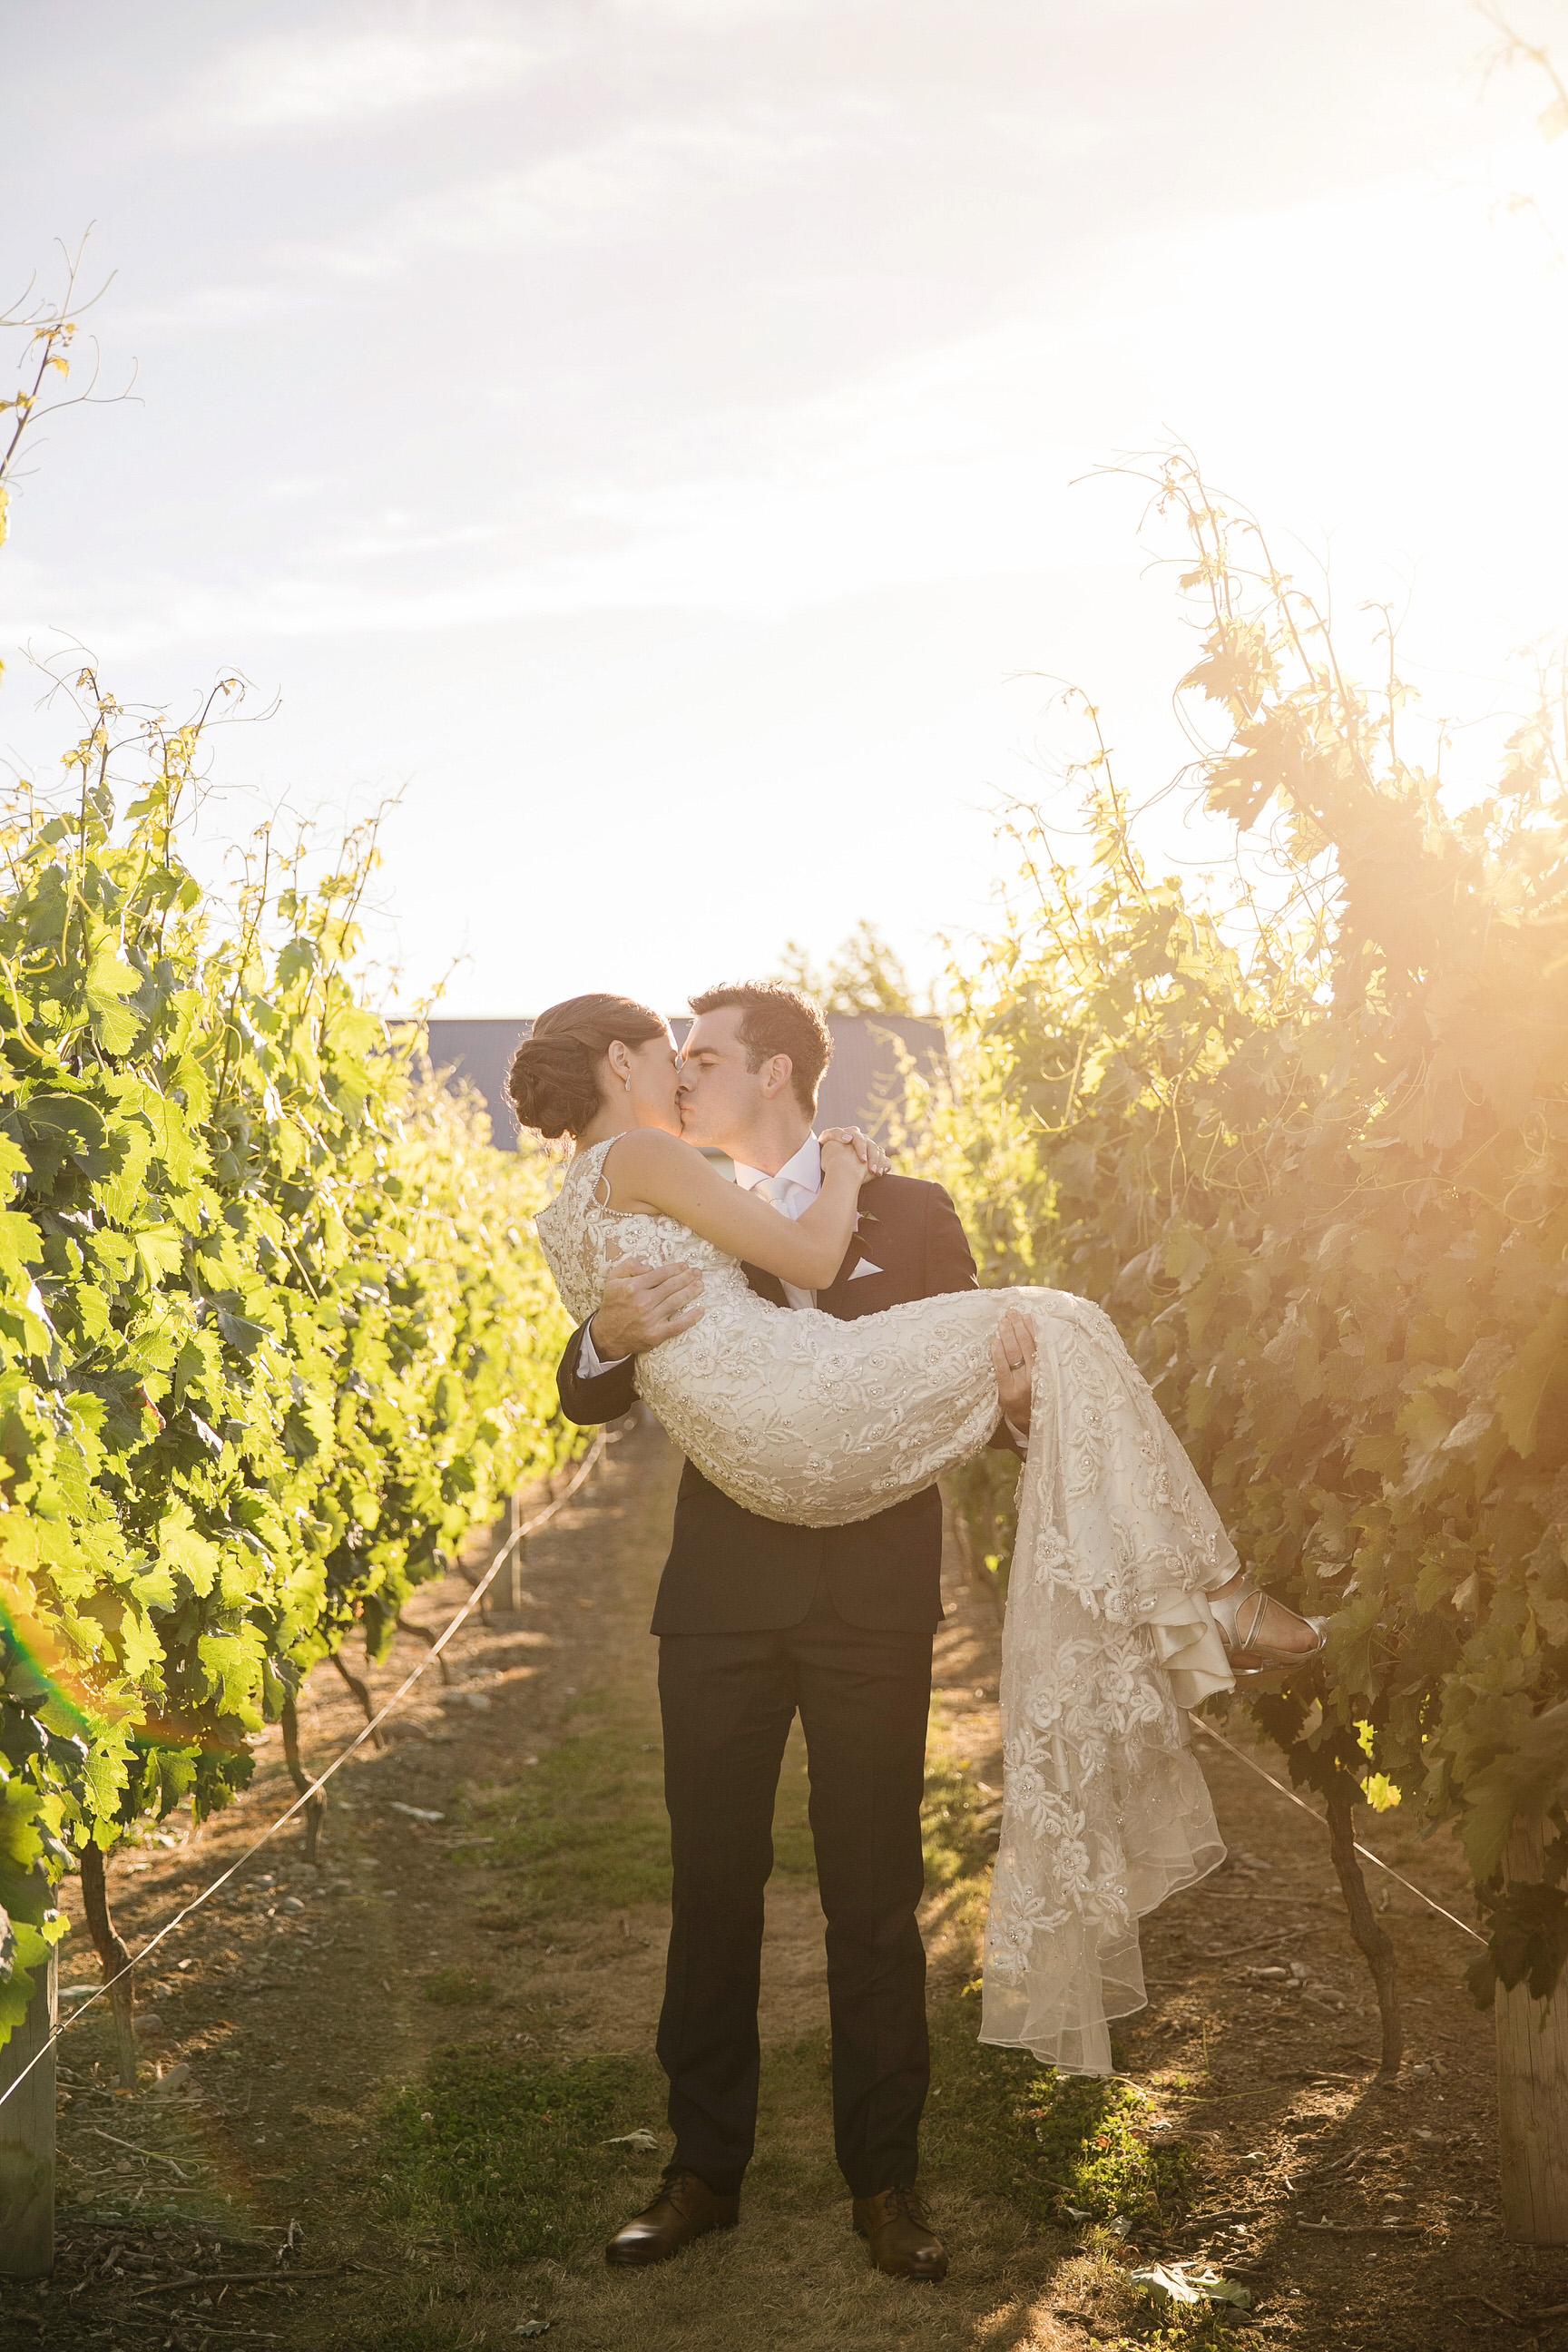 Martinborough-Poppies-Wedding-Caine-Eloise-Toni-Larsen-0109.jpg